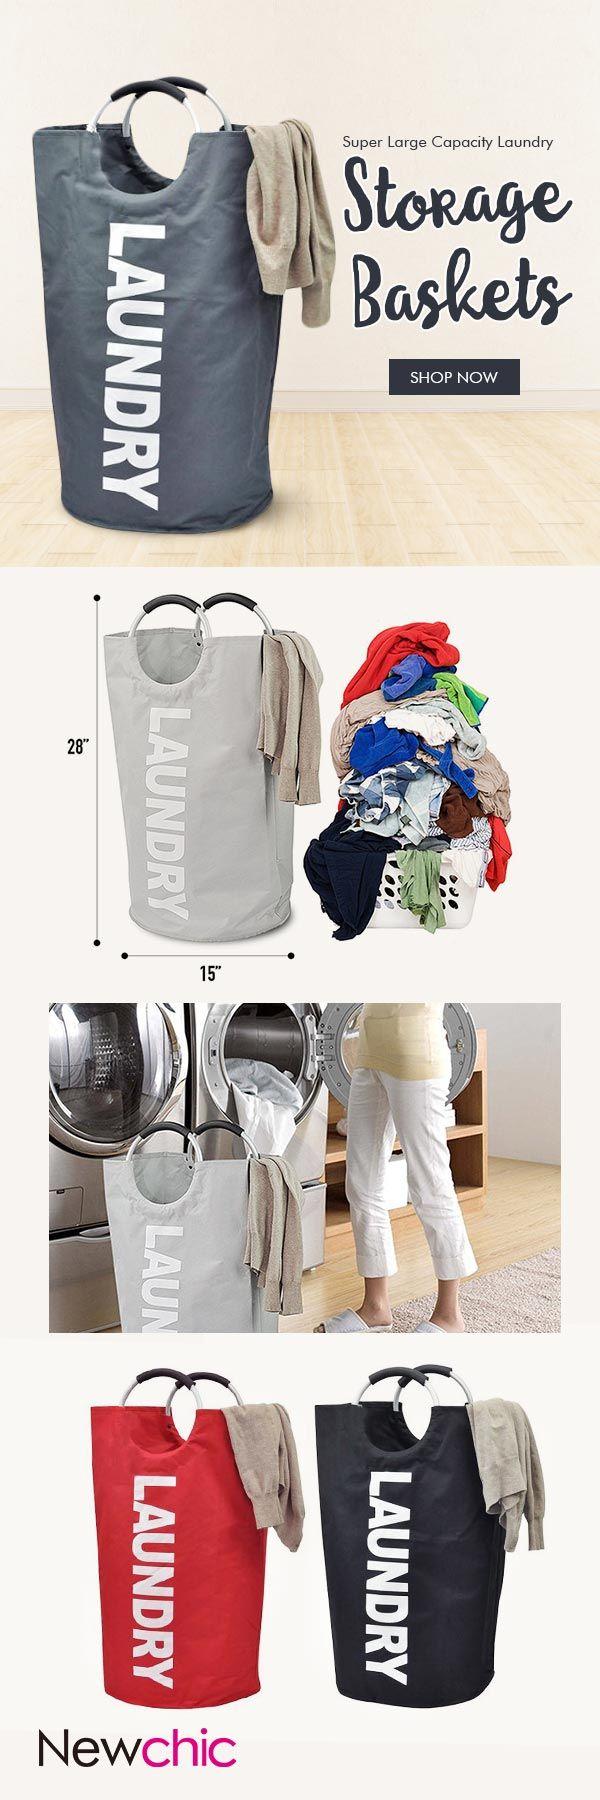 #fashion#bag#home#organization#diy#laundry